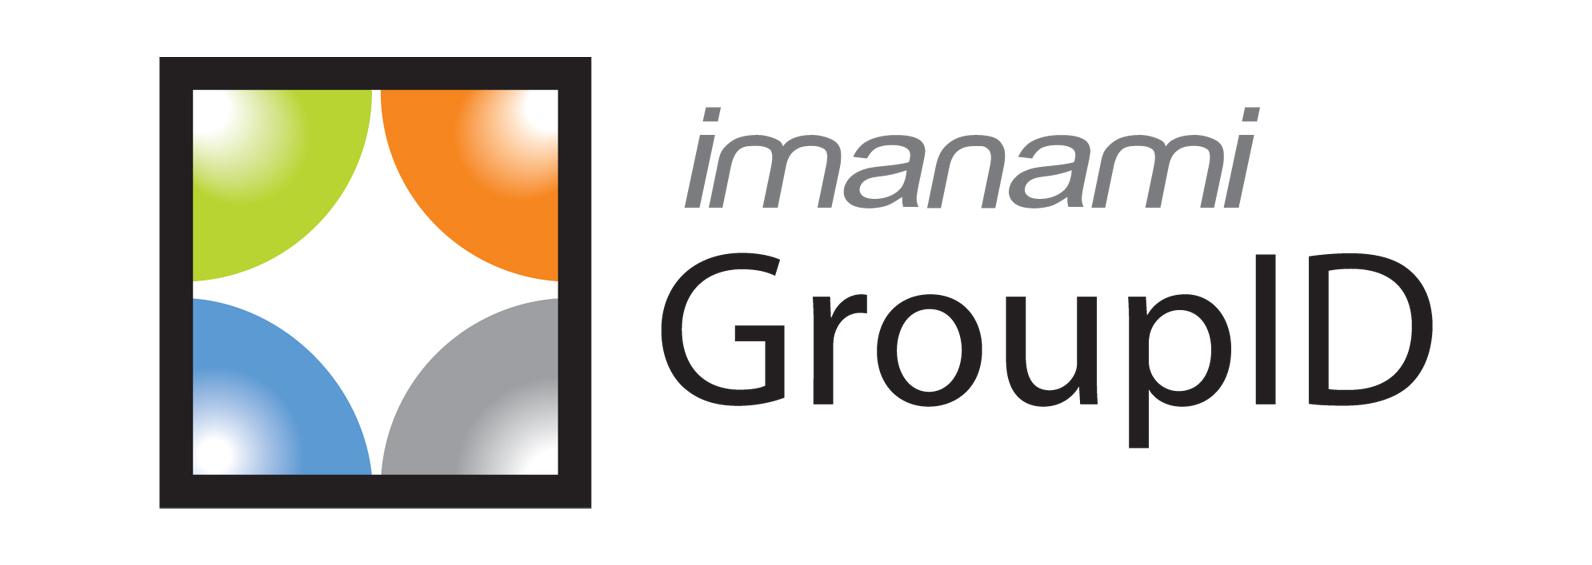 Imanami_Groupid_logo_Bay_Area_Inbound